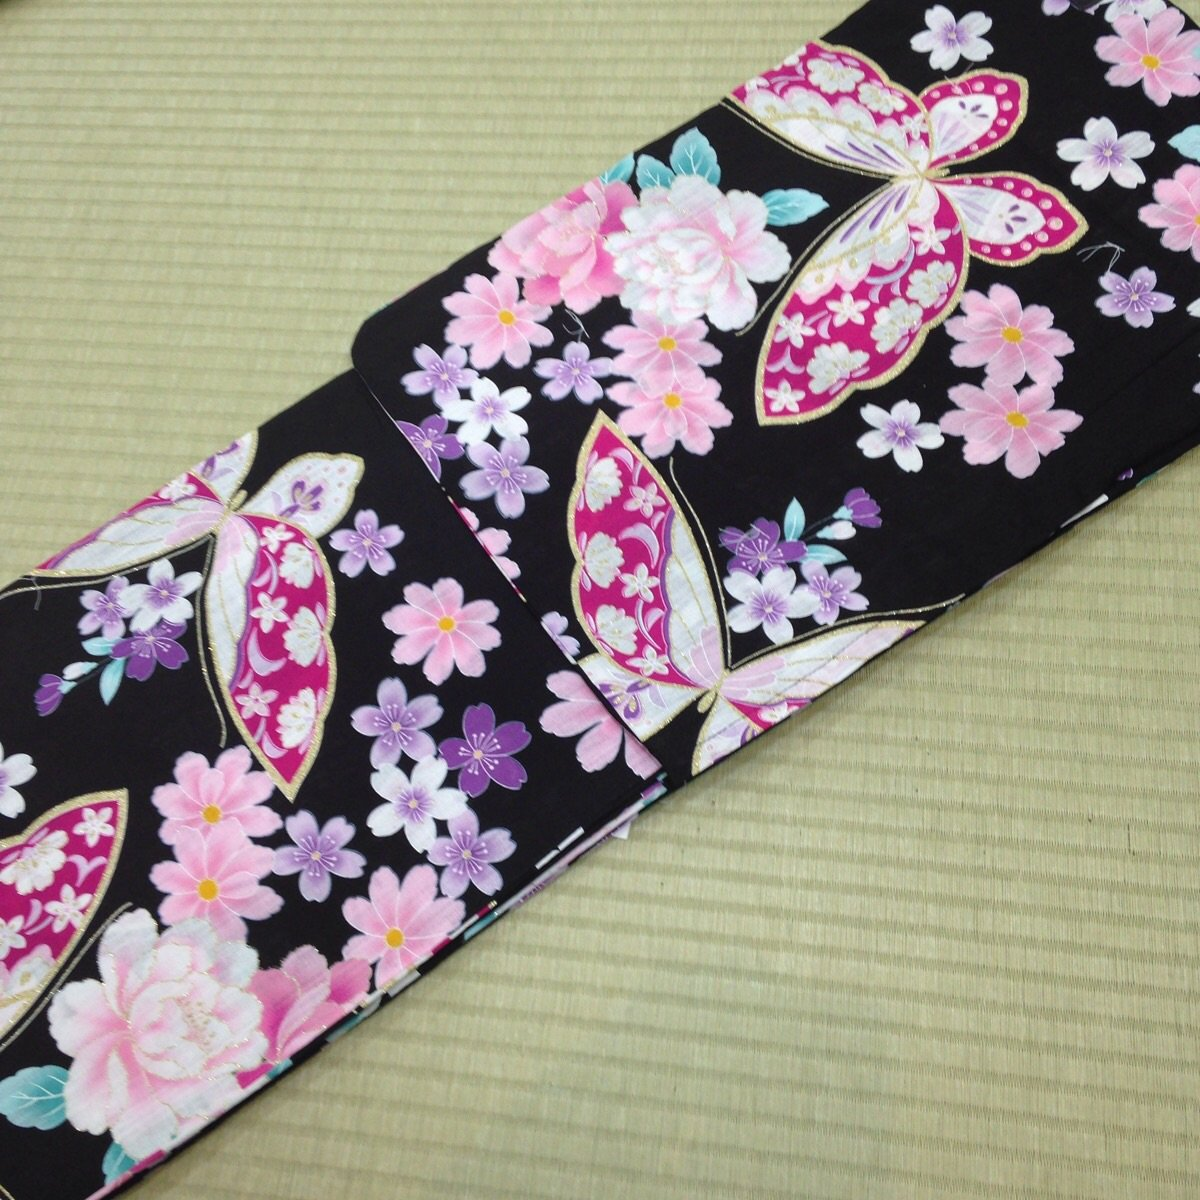 Summer Butterfly Flower Yukata Set Kimono Dress Maiko Regular M Girl's JAPAN NEW